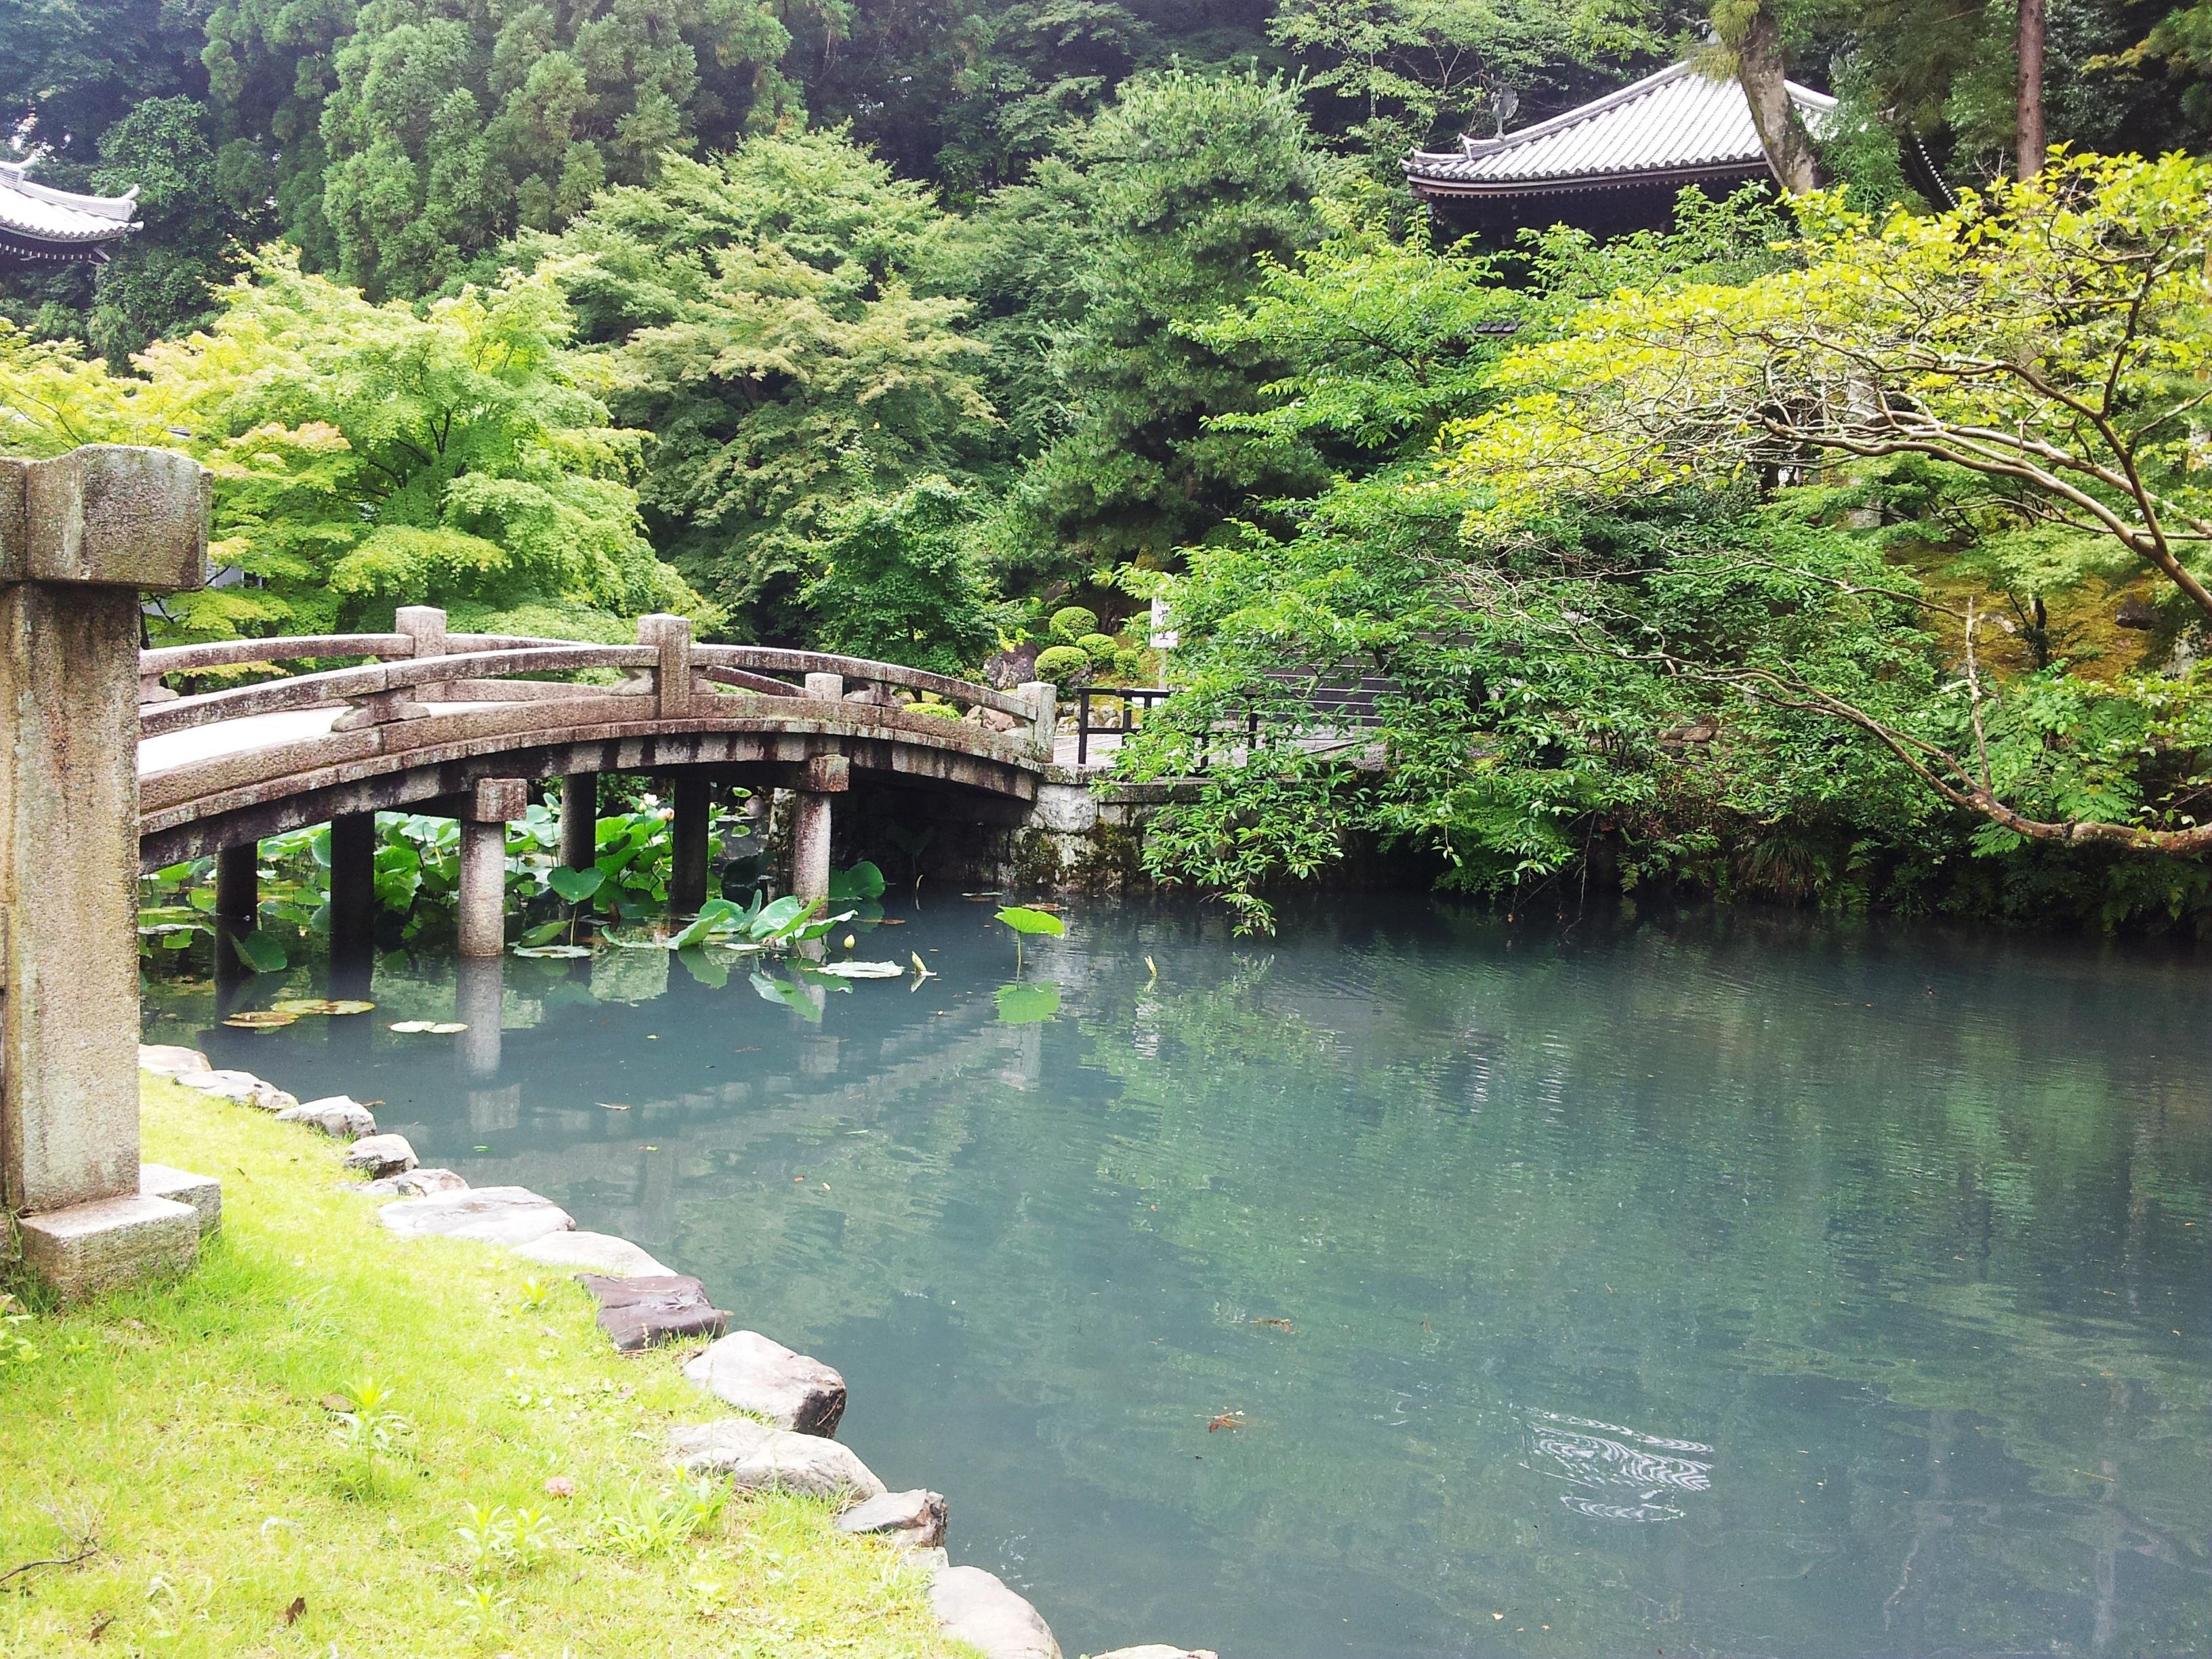 [IMG]http://www.margutte.com/wordpress/wp-content/uploads/2015/09/Kyoto7cop.jpg[/IMG]